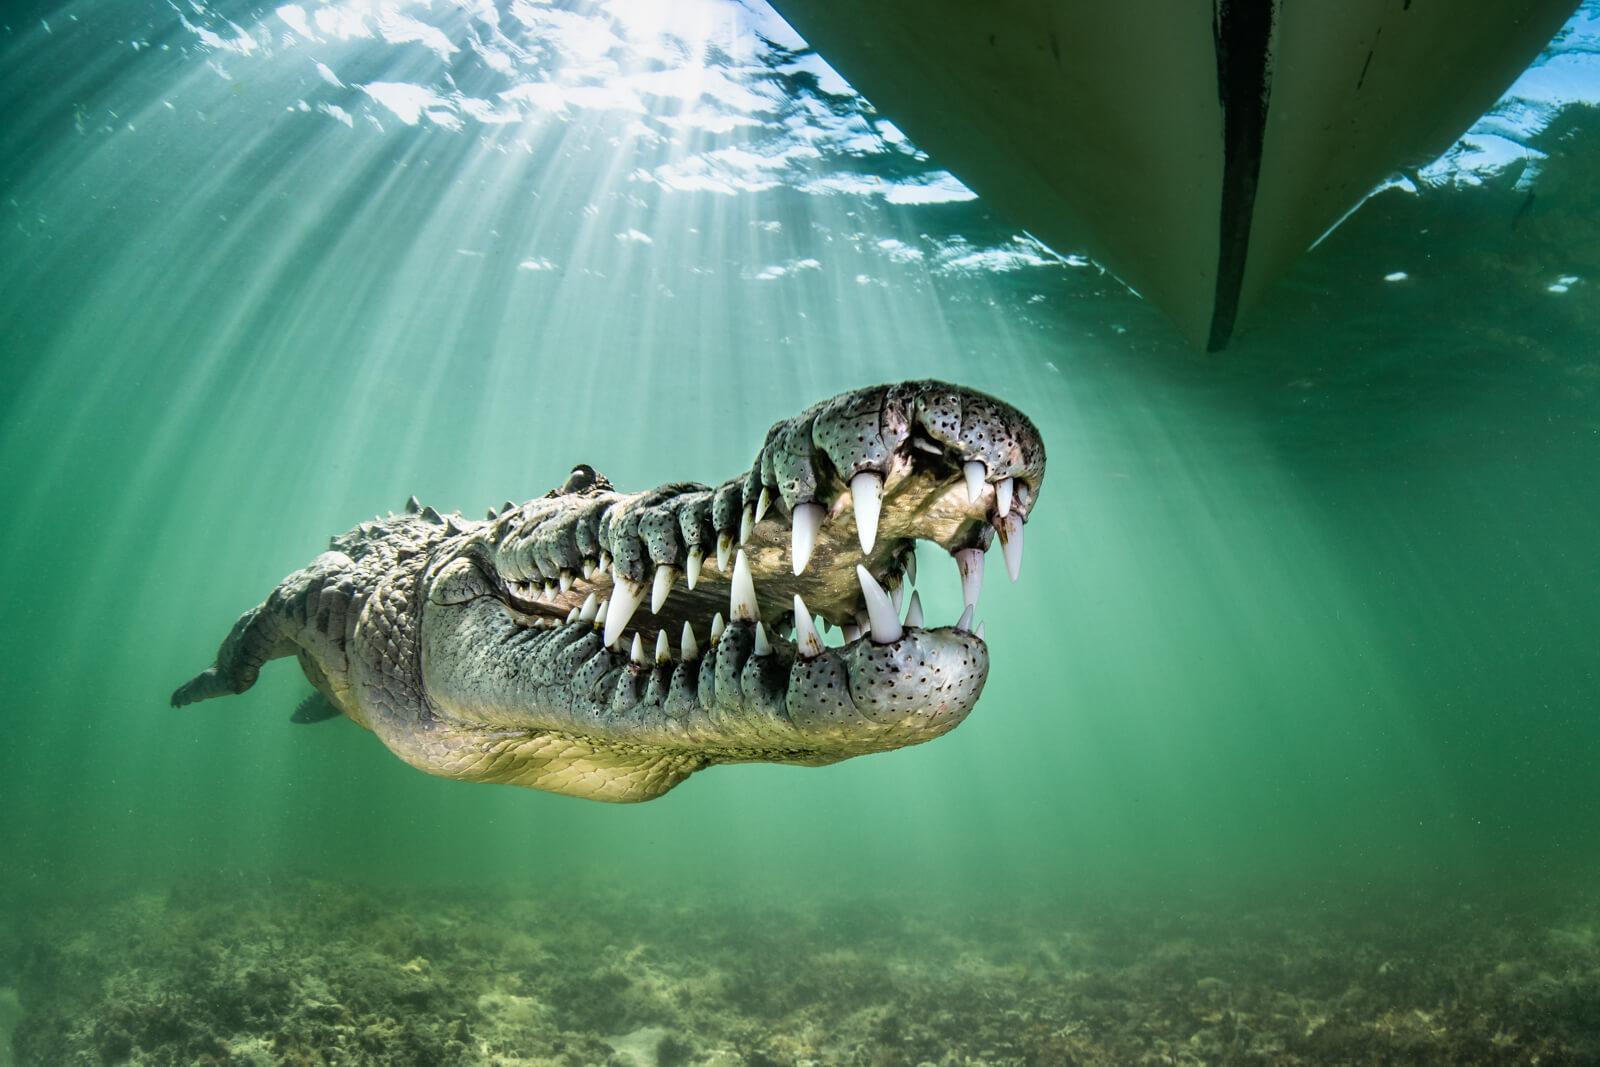 Ron Watkins underwater photography, crocodile, Cuba